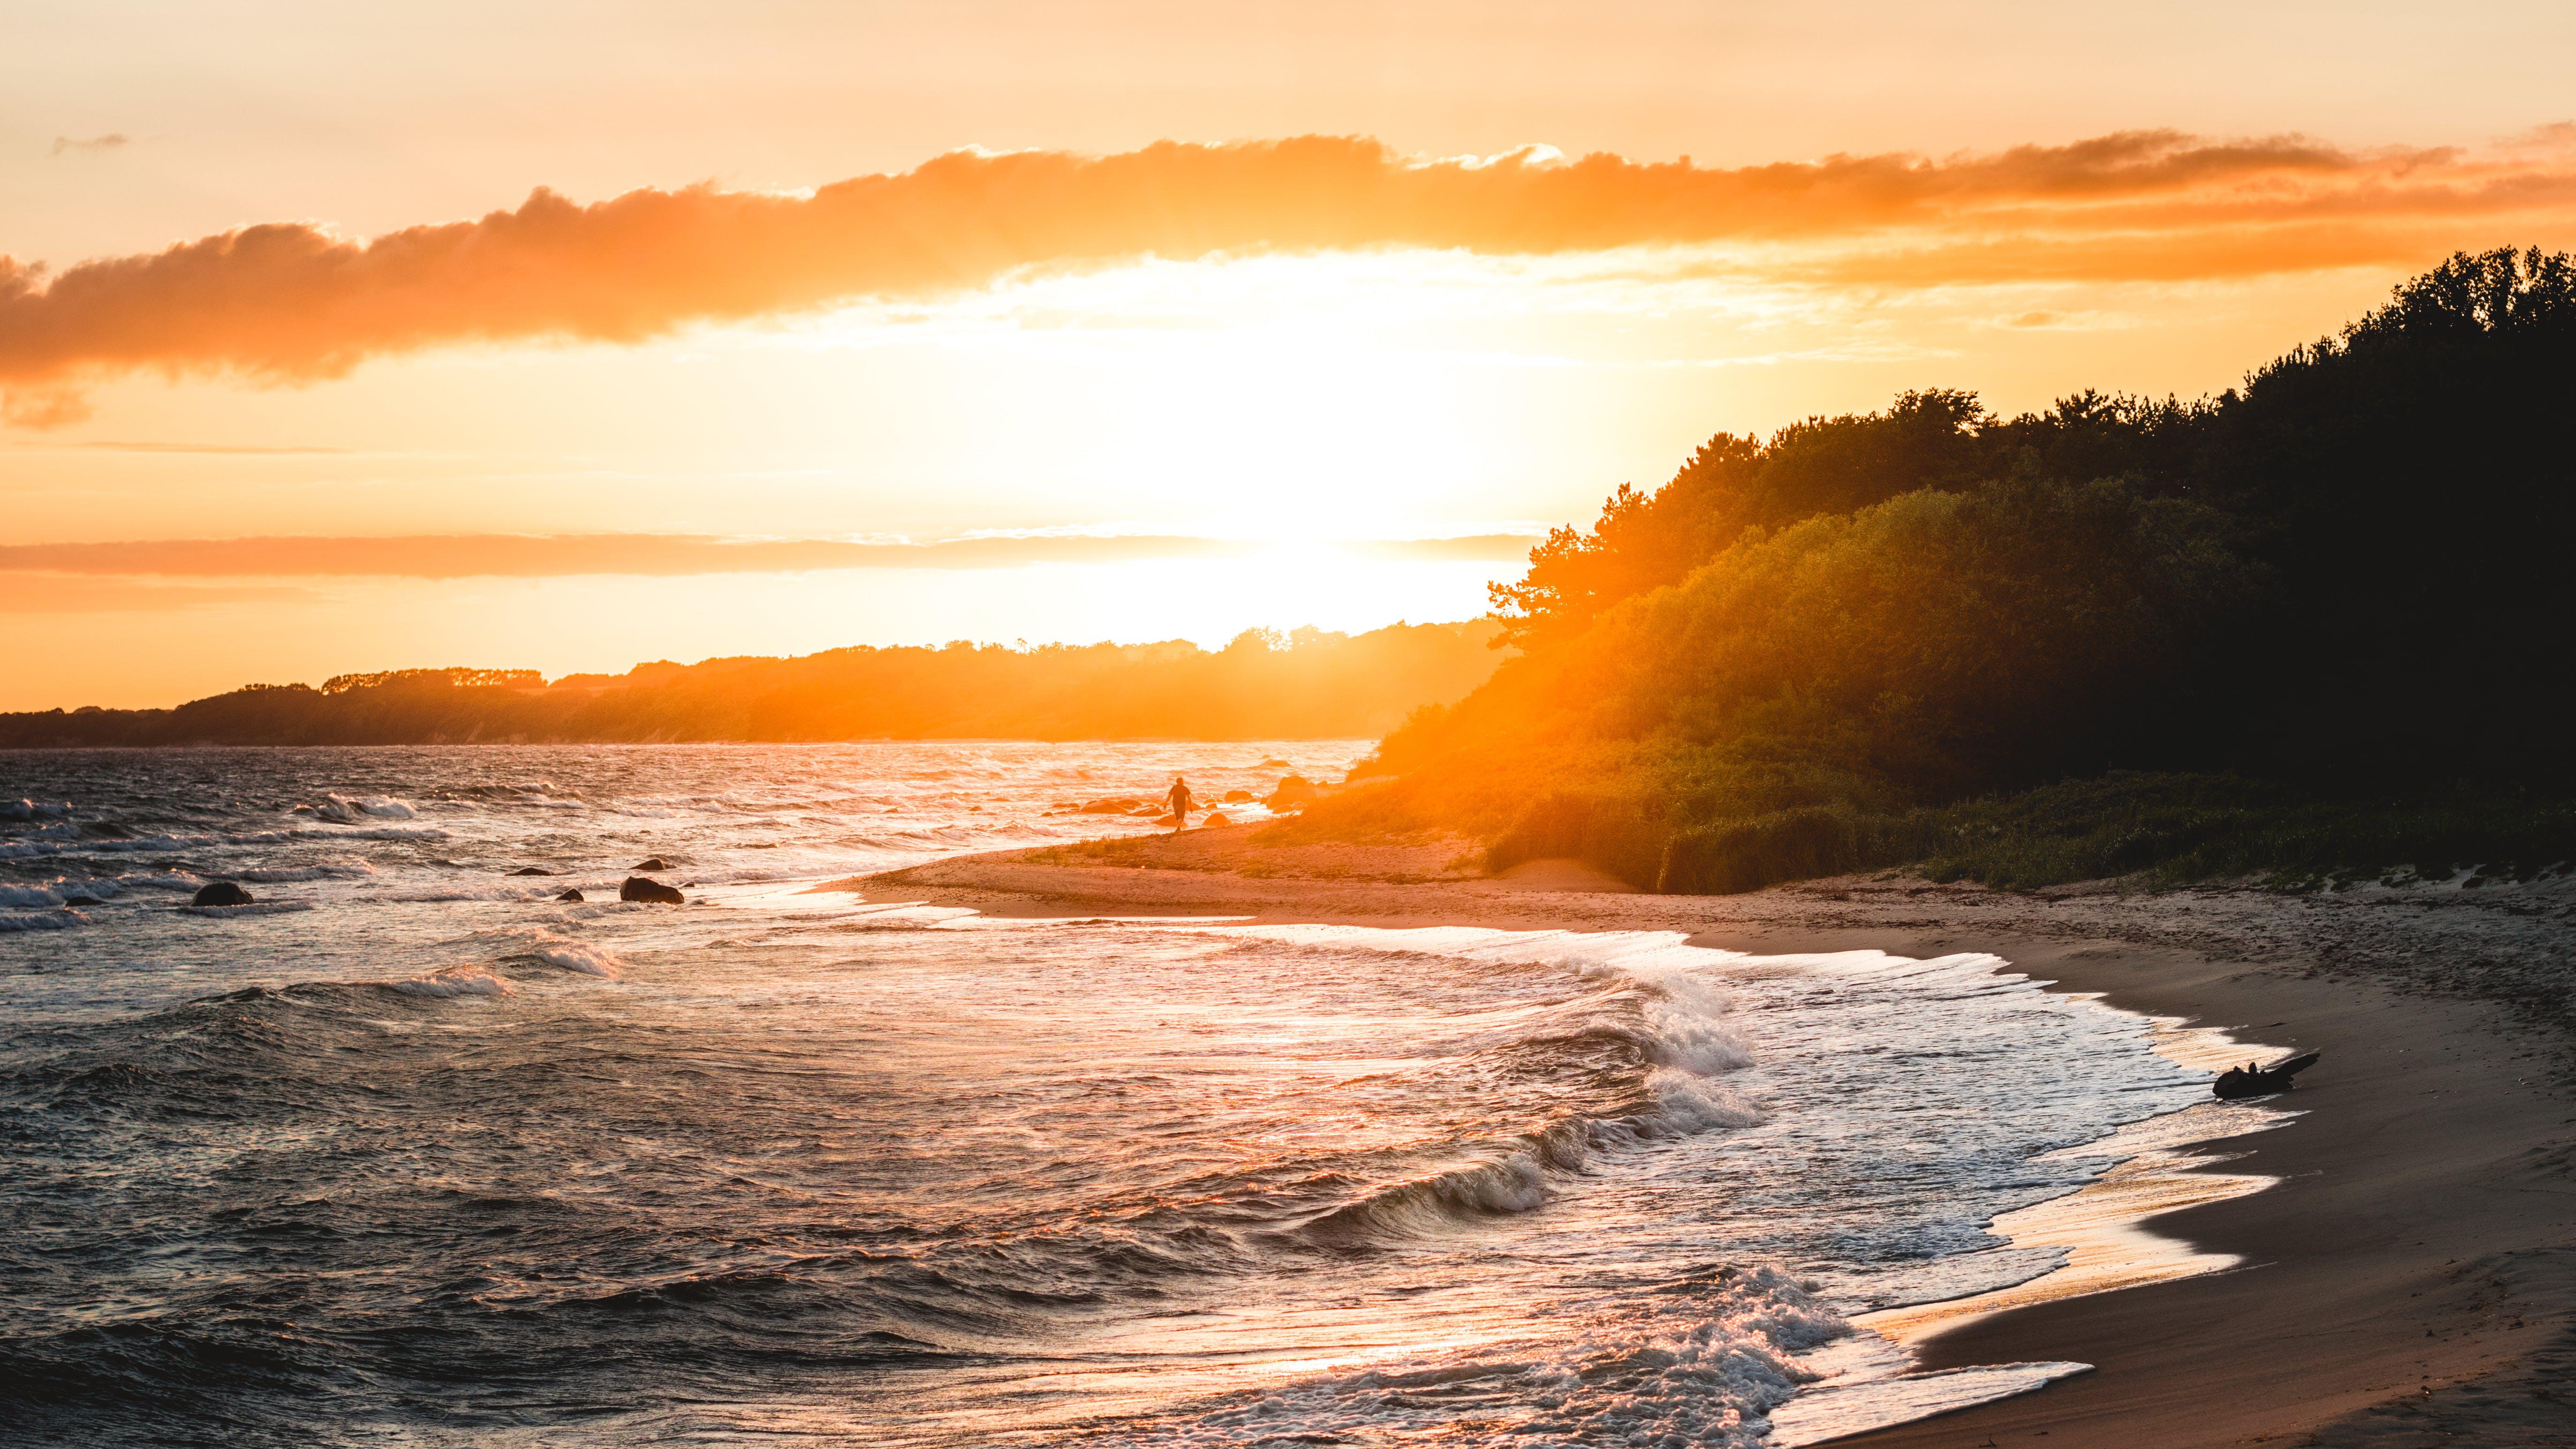 Gray Sand Beach during Sunset